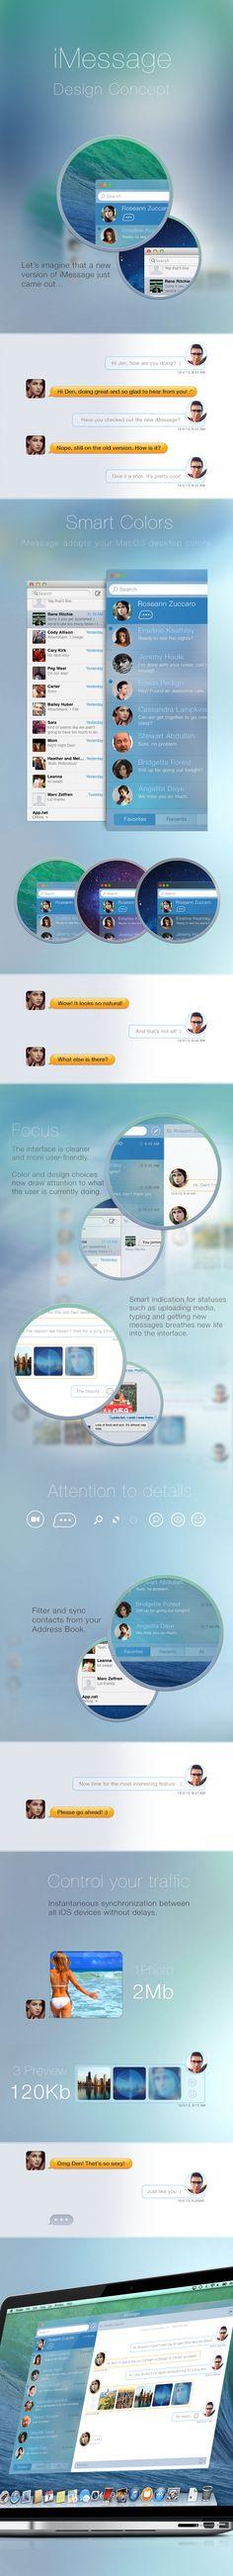 Messages.app Concept #interface #ui #ux #gui #app #flatdesign #dribbble #behance #inspiration #mobile #ramotion #application #appdesign